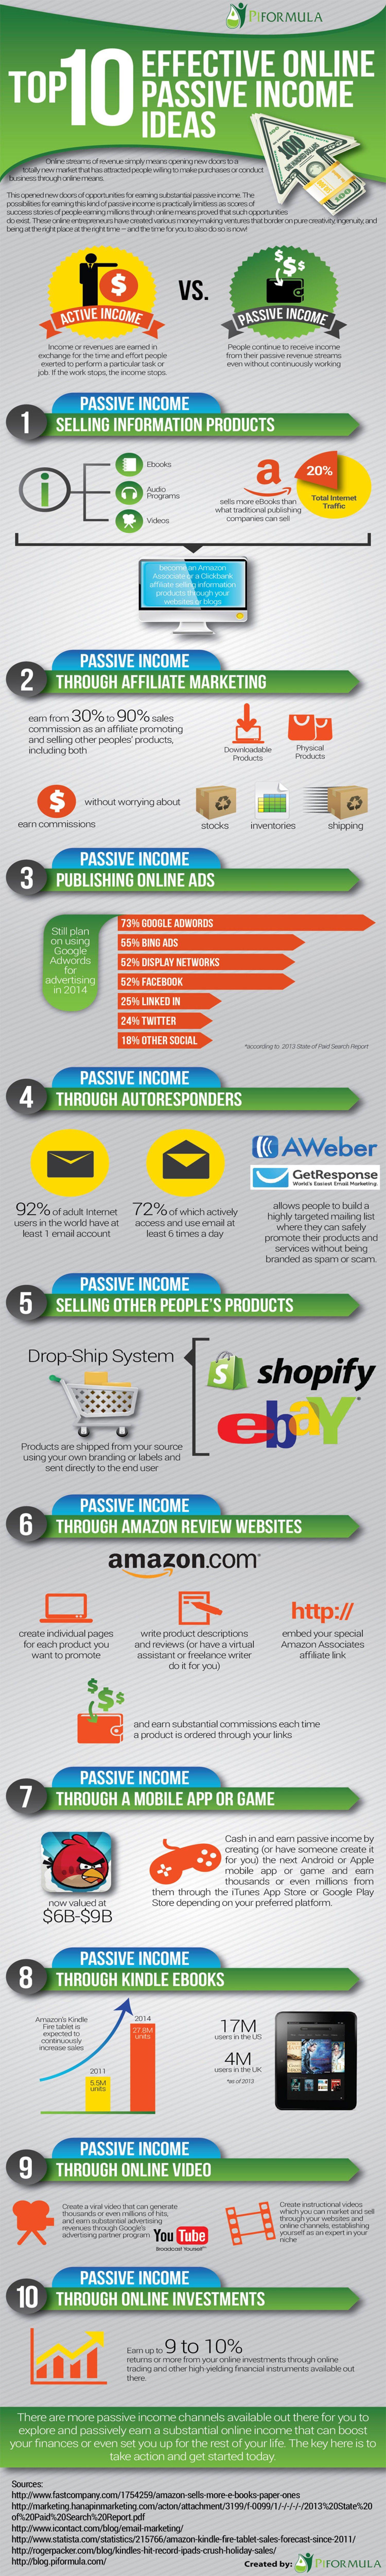 10 Effective Online Passive Income Ideas